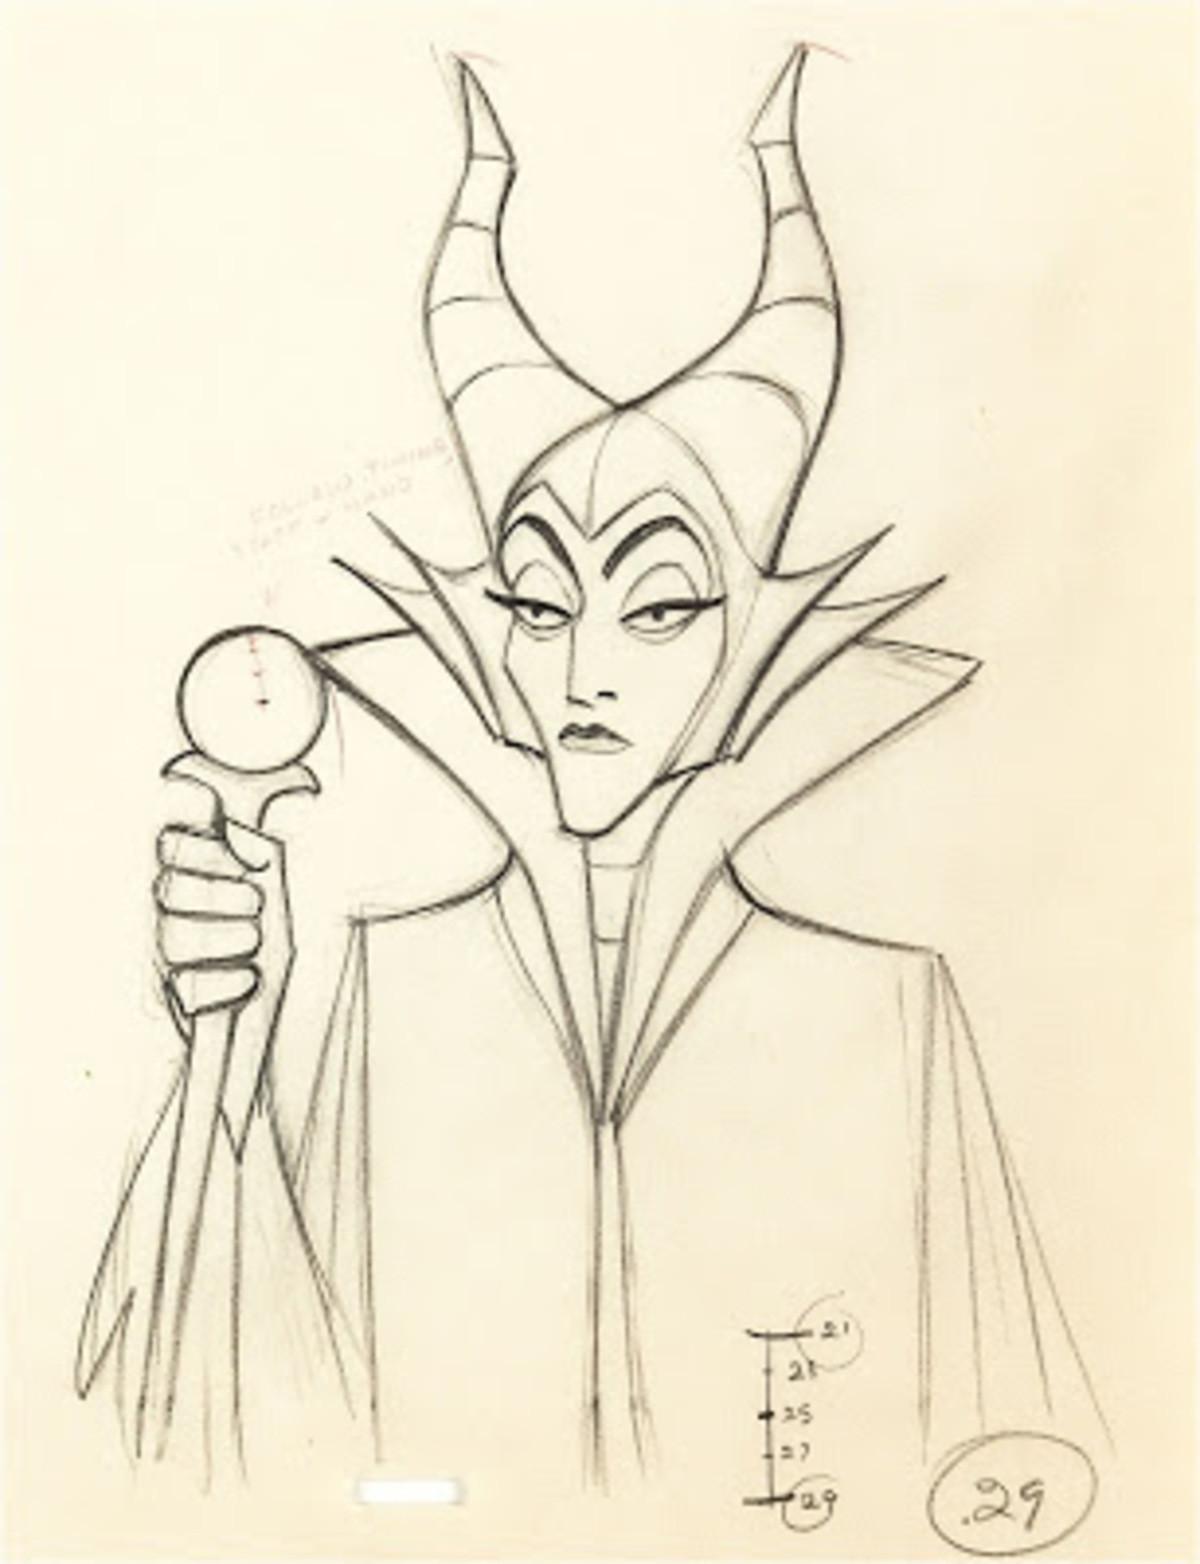 Disney's Sleeping Beauty (1959) -- The Maleficent Scenes